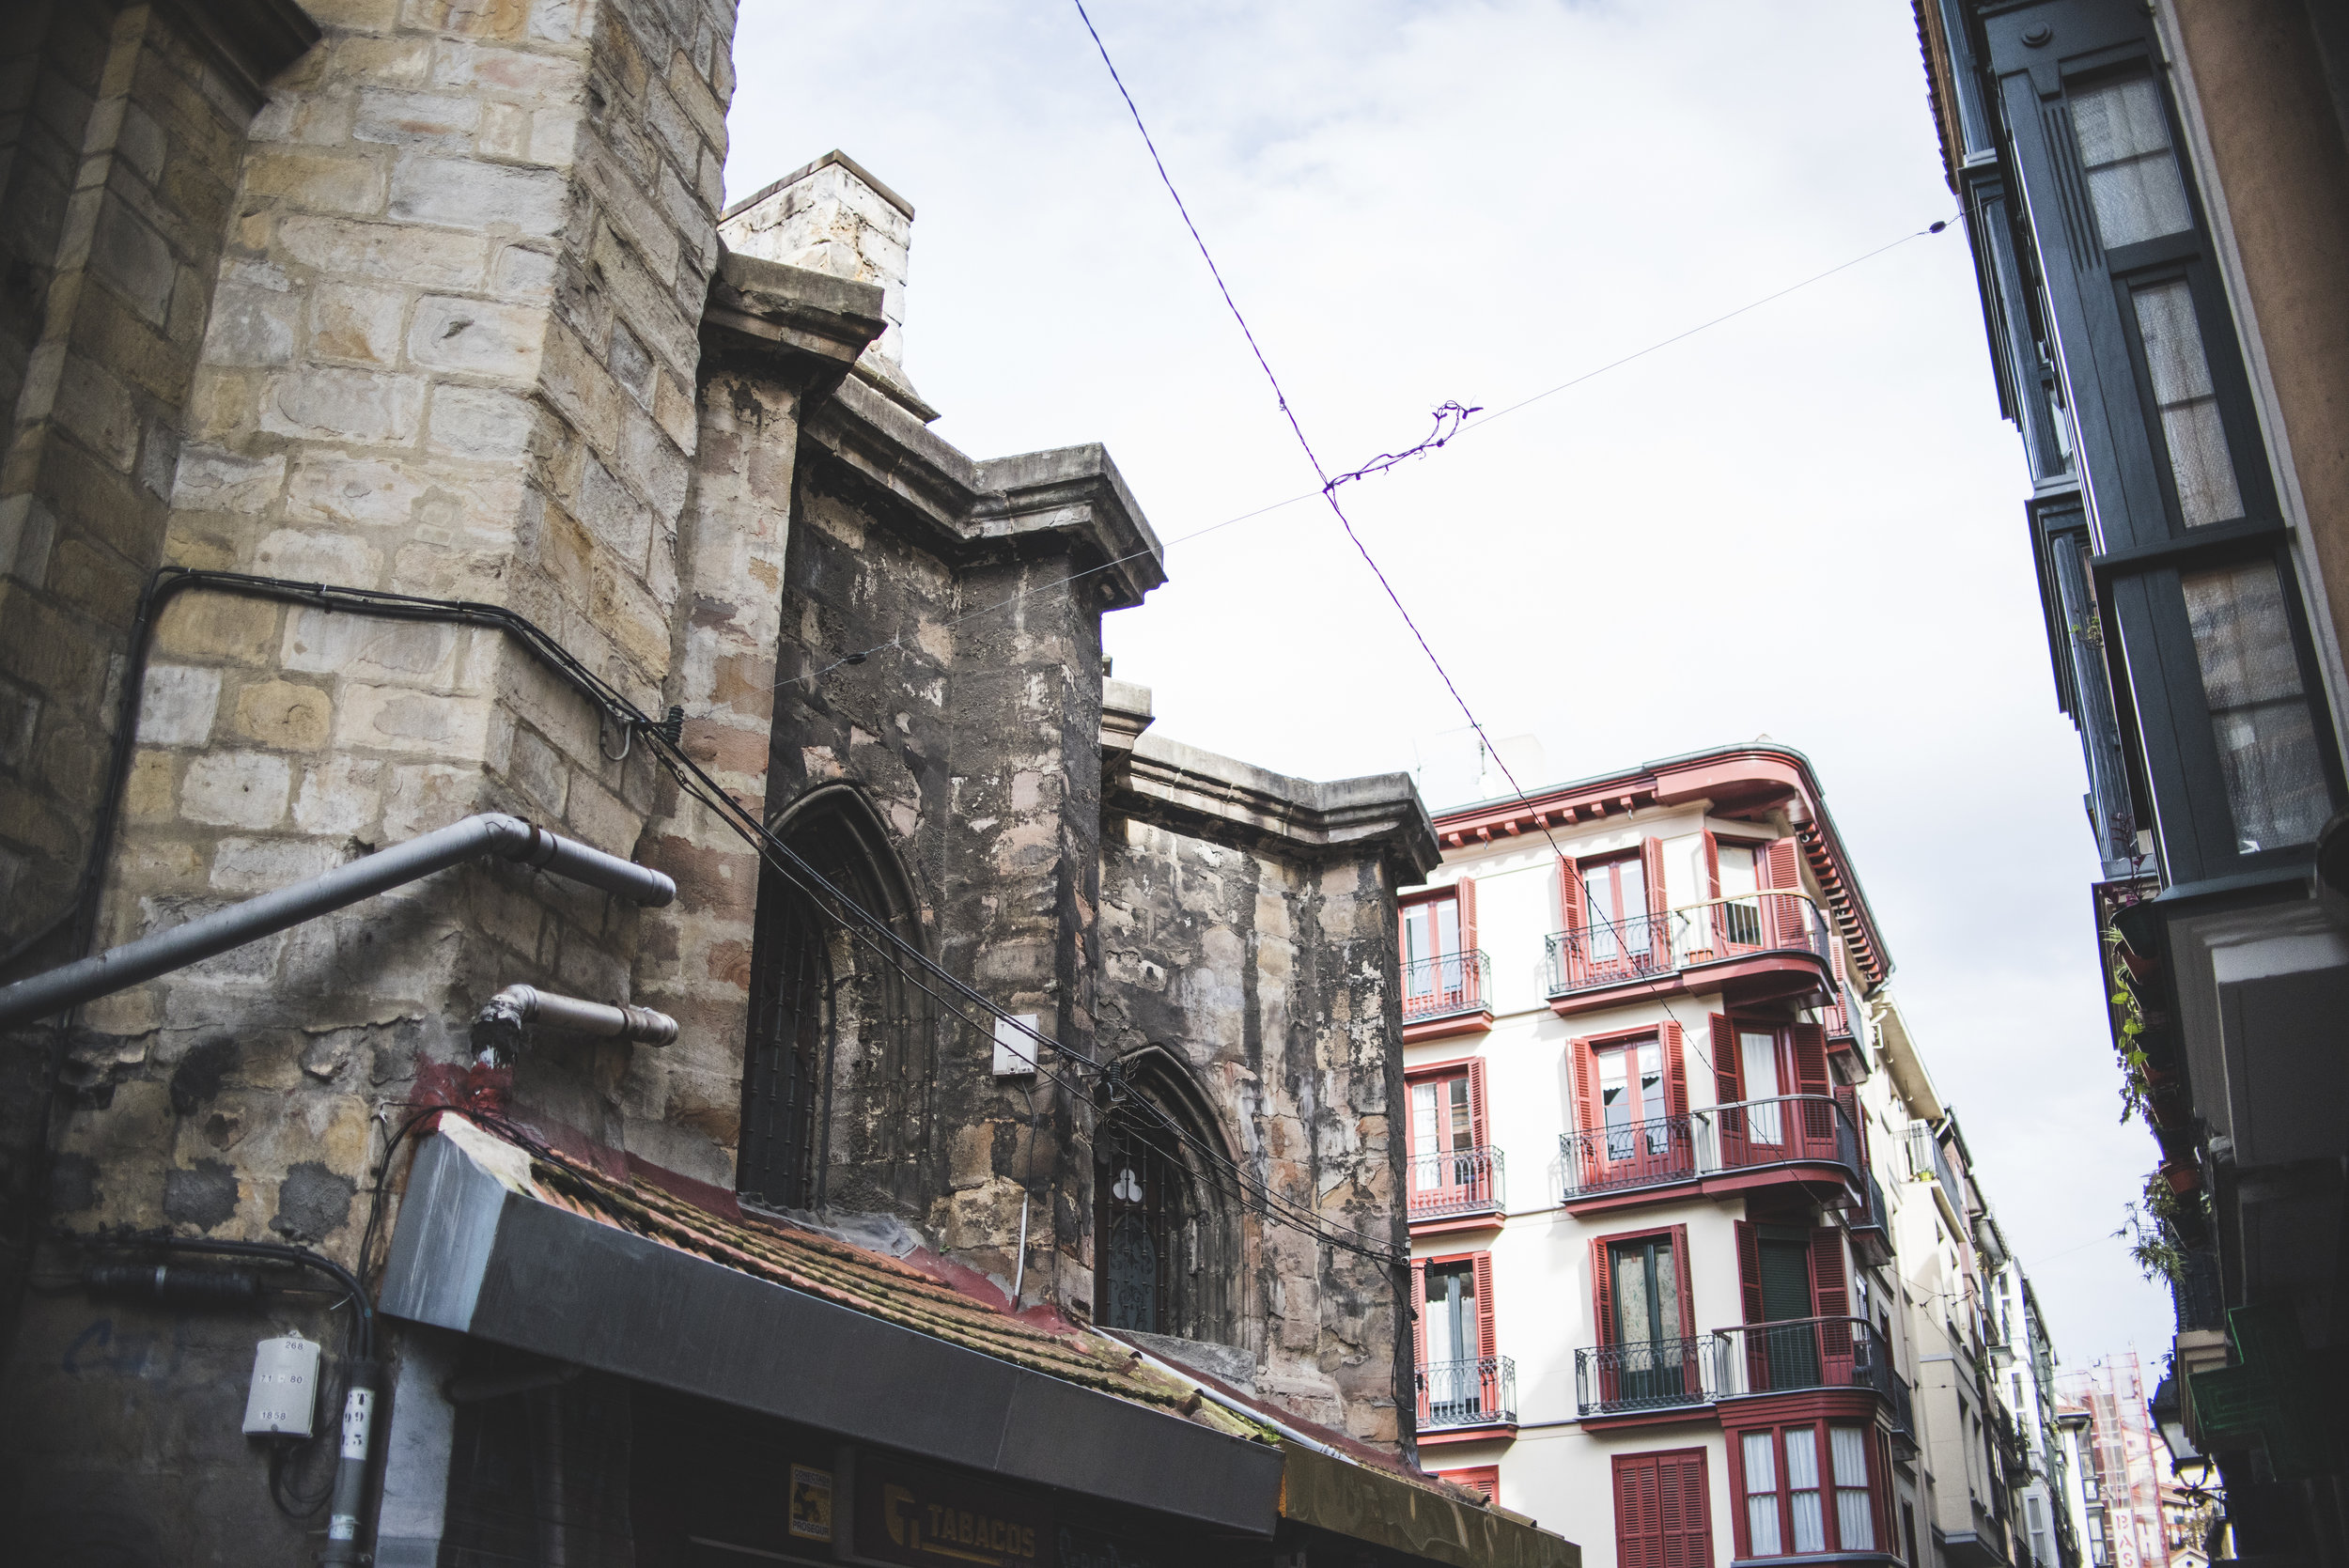 Malaga_Roadtrip-59.jpg